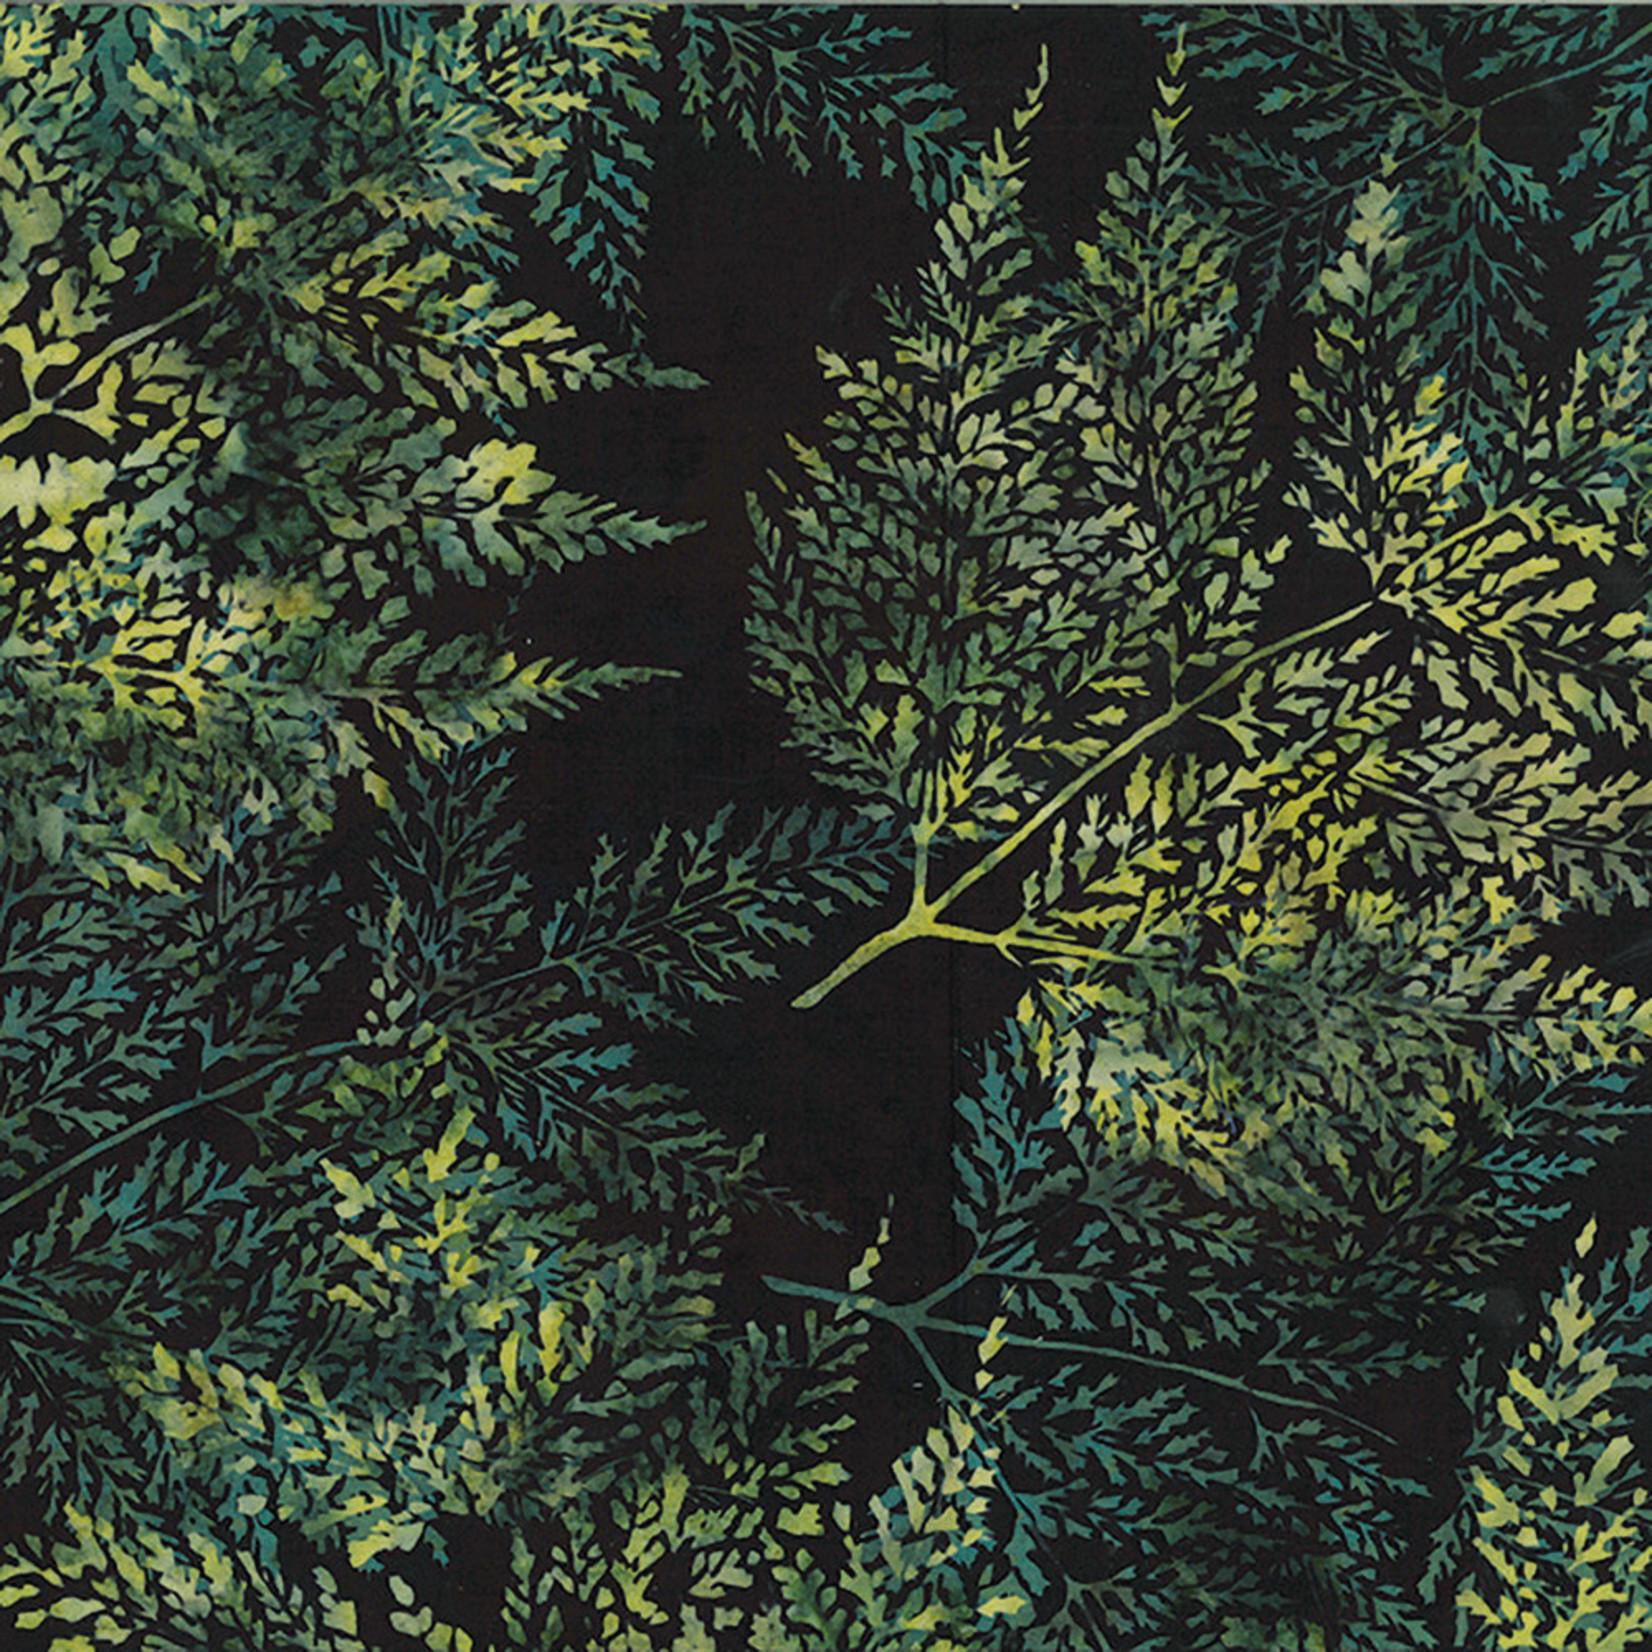 Hoffman Fabrics Bali Batik Skeleton Leaves - Stone Green